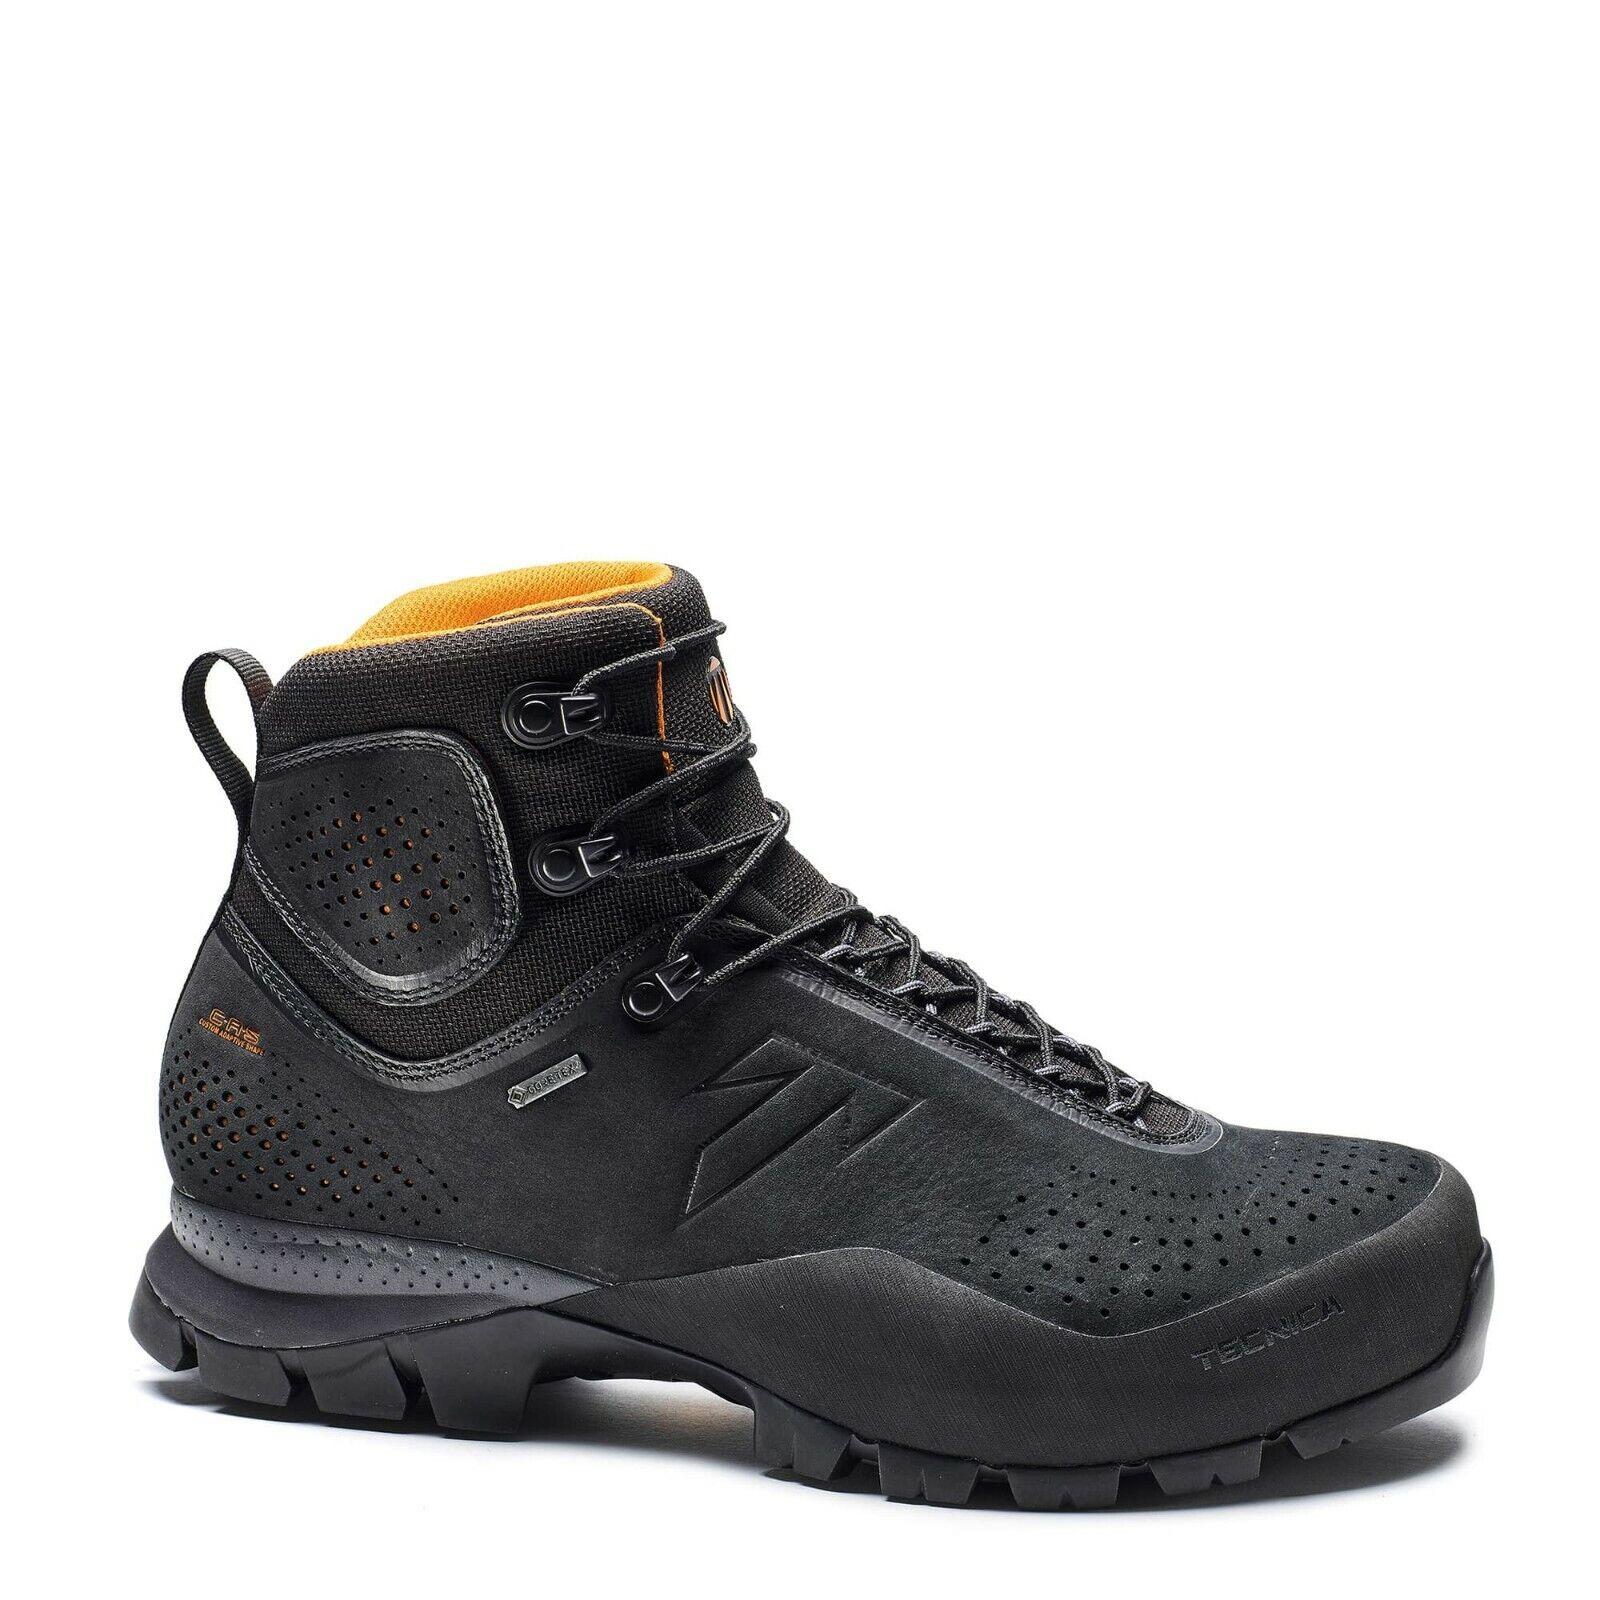 Zapatos Trekking Senderismo Tecnica Force GTX Ms